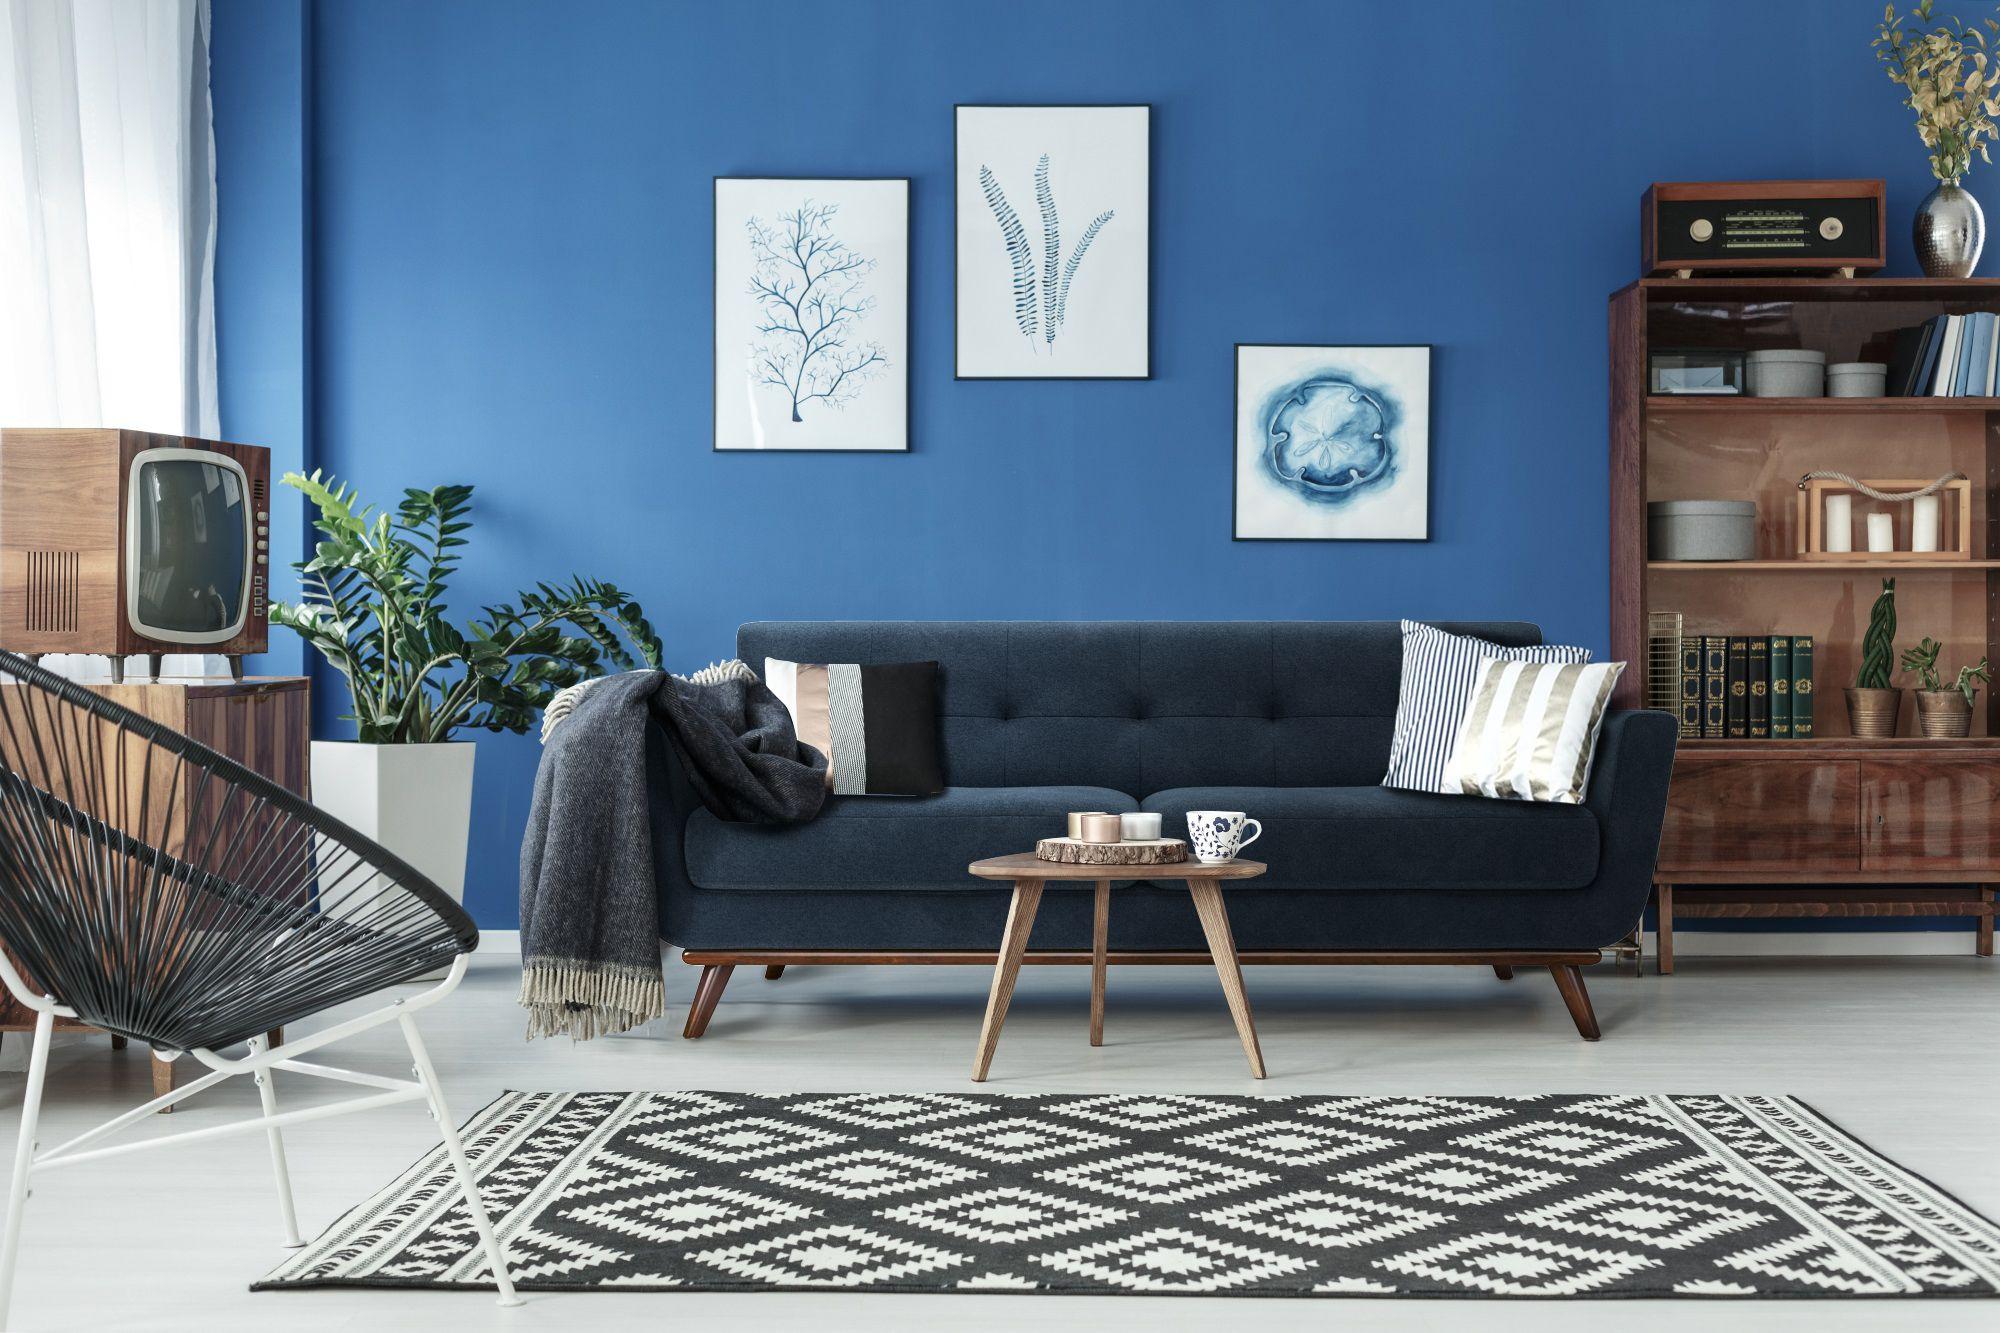 shelby sofa loveseats home staging home decor living room paint rh pinterest com